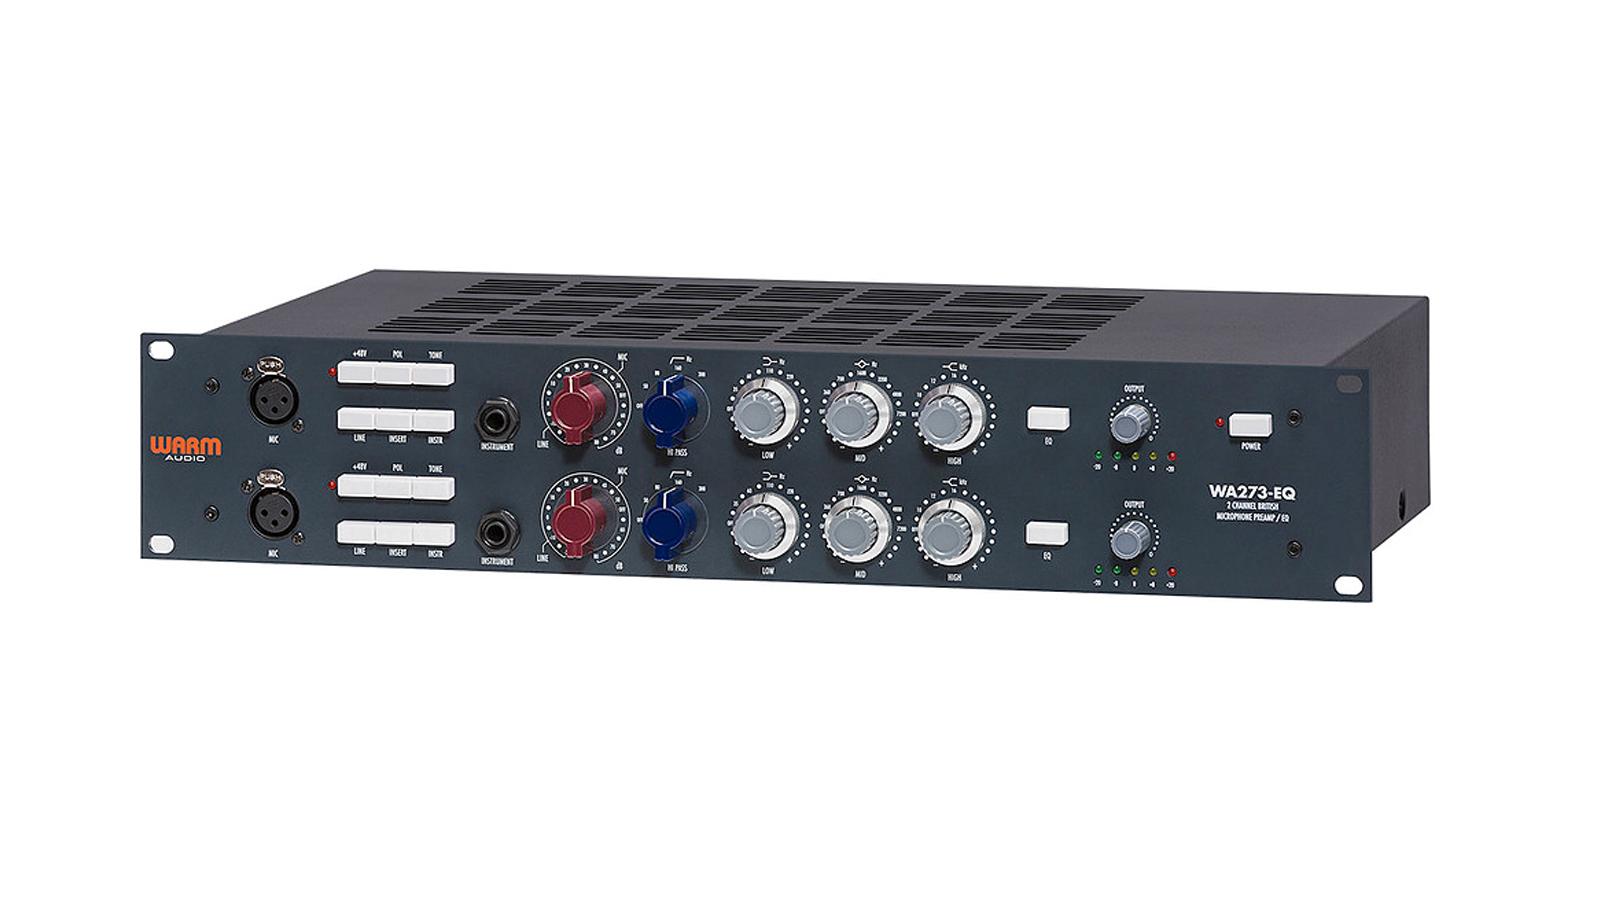 Warm Audio WA273-EQ 2-Kanal Vorverstärker